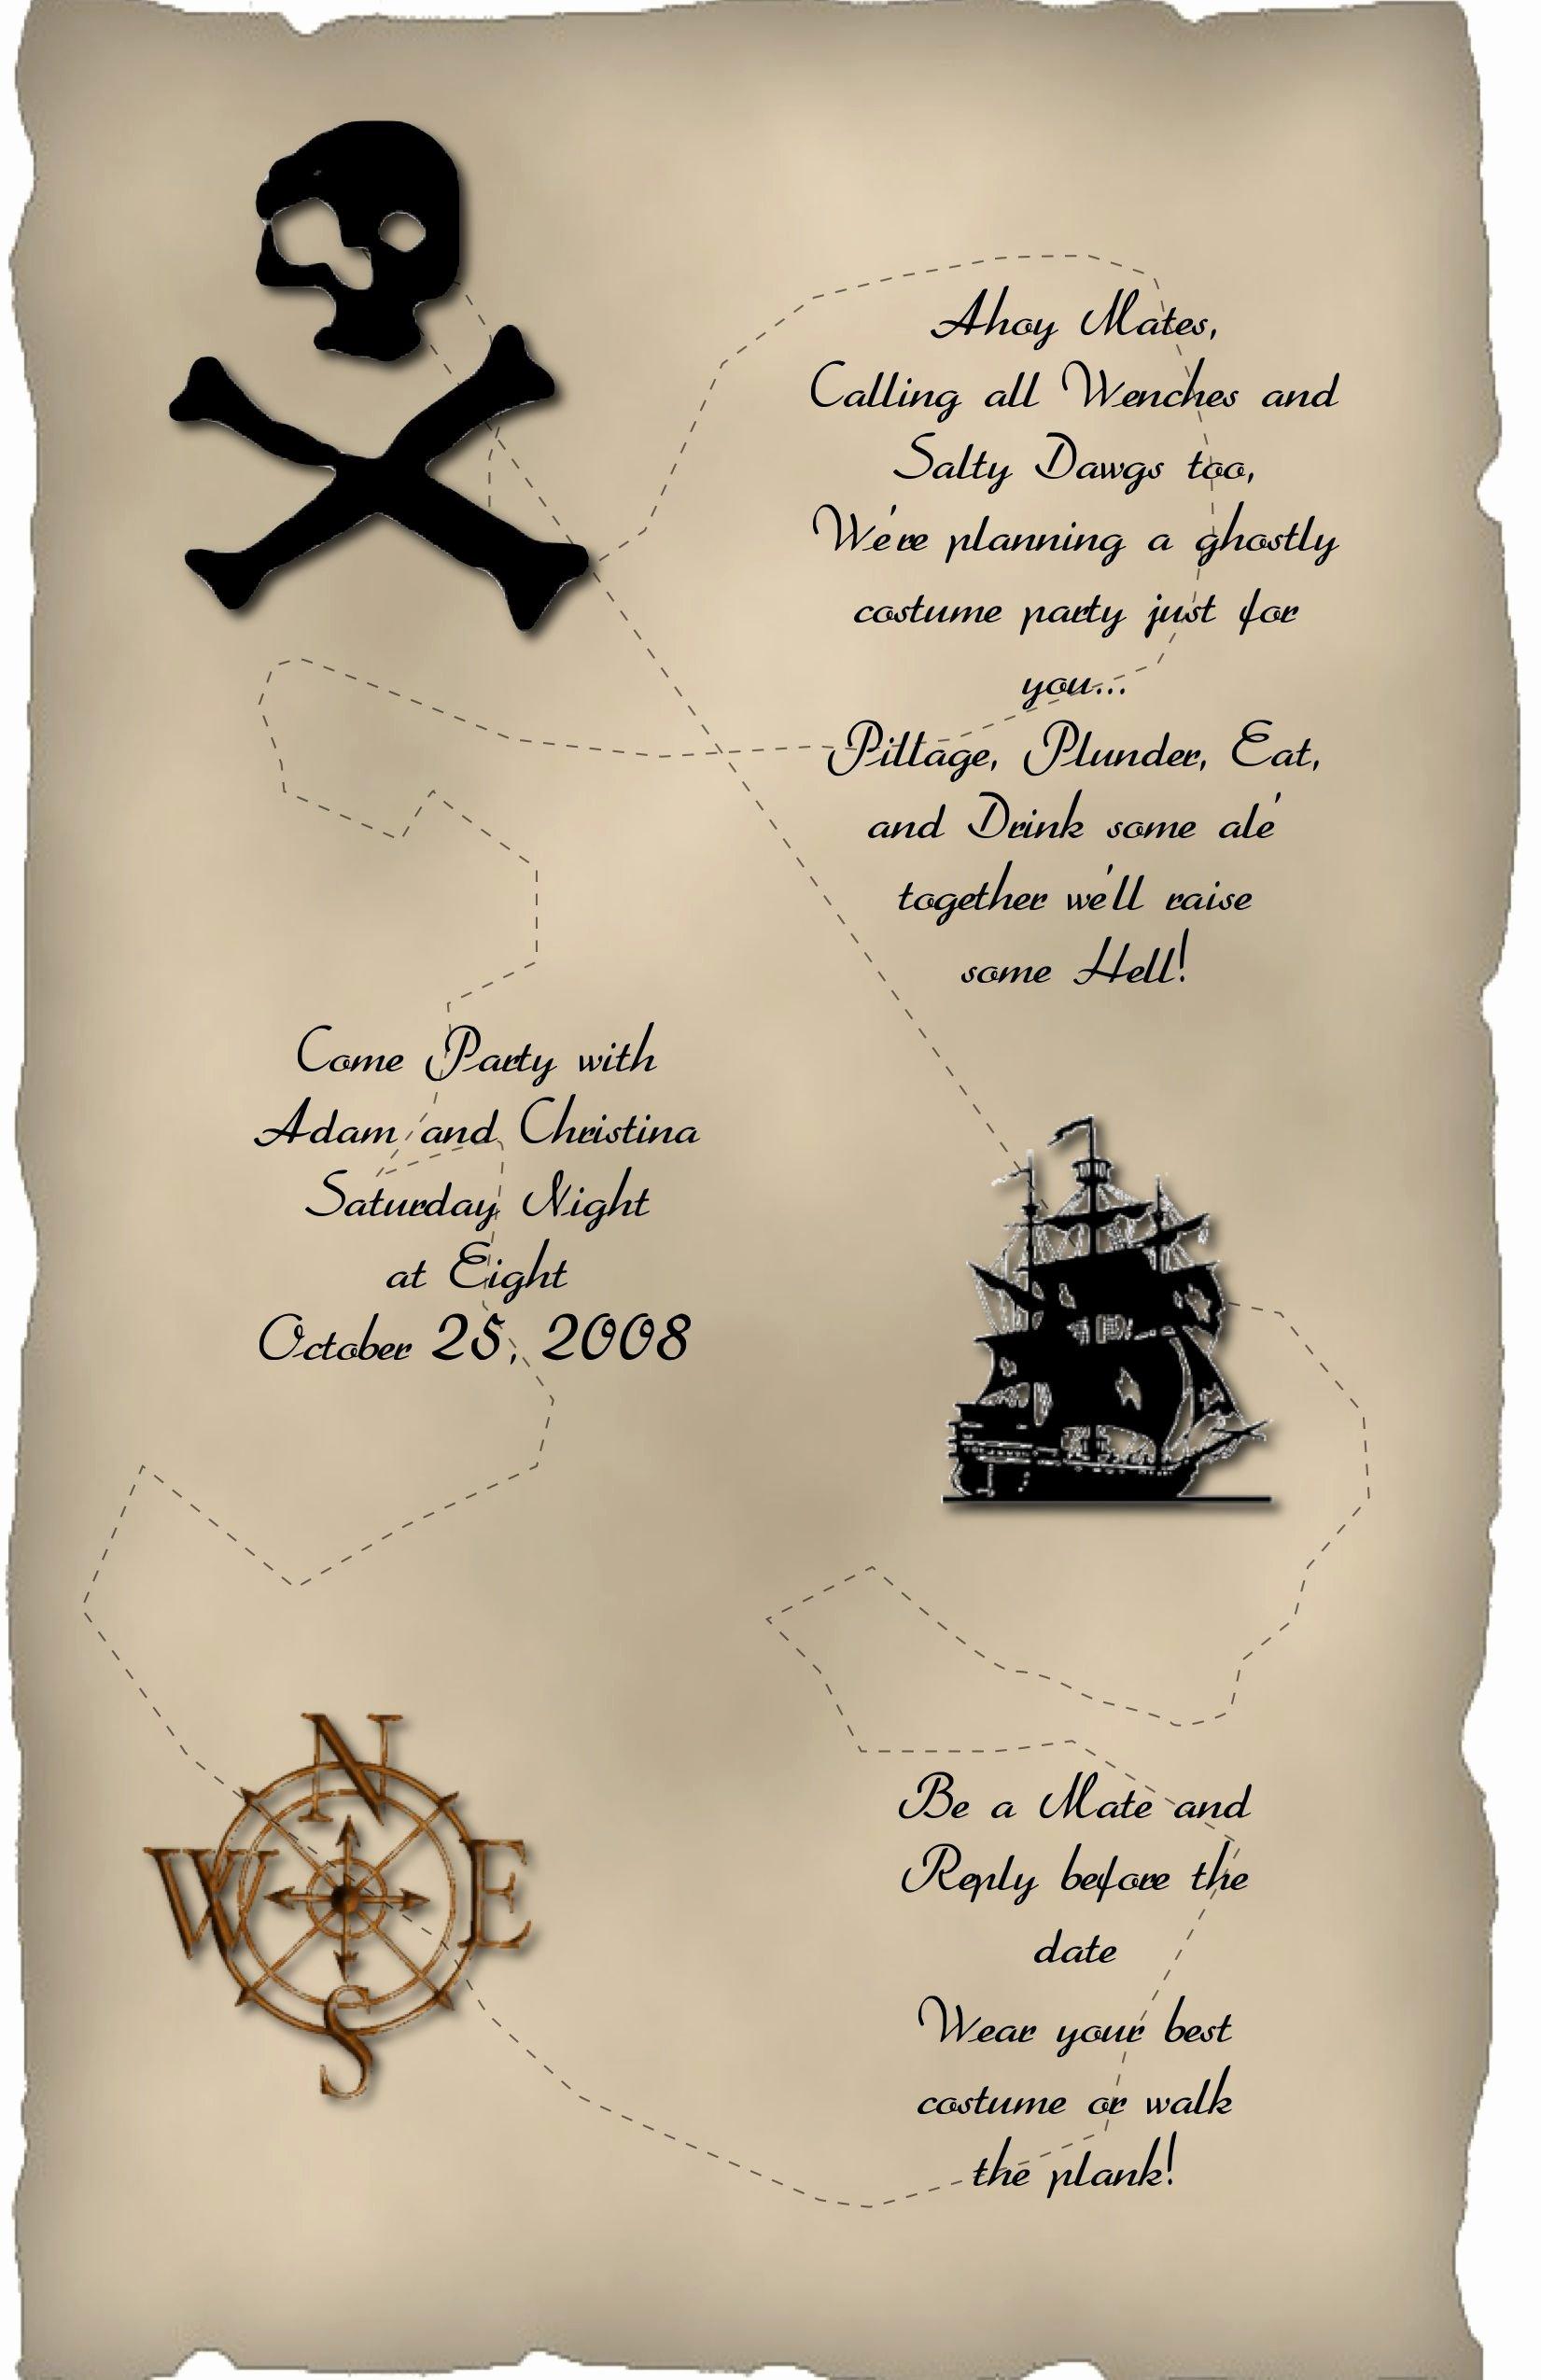 Halloween Wedding Invitation Wording Inspirational Halloween Invitation Wording Pirate theme Halloween Pinterest